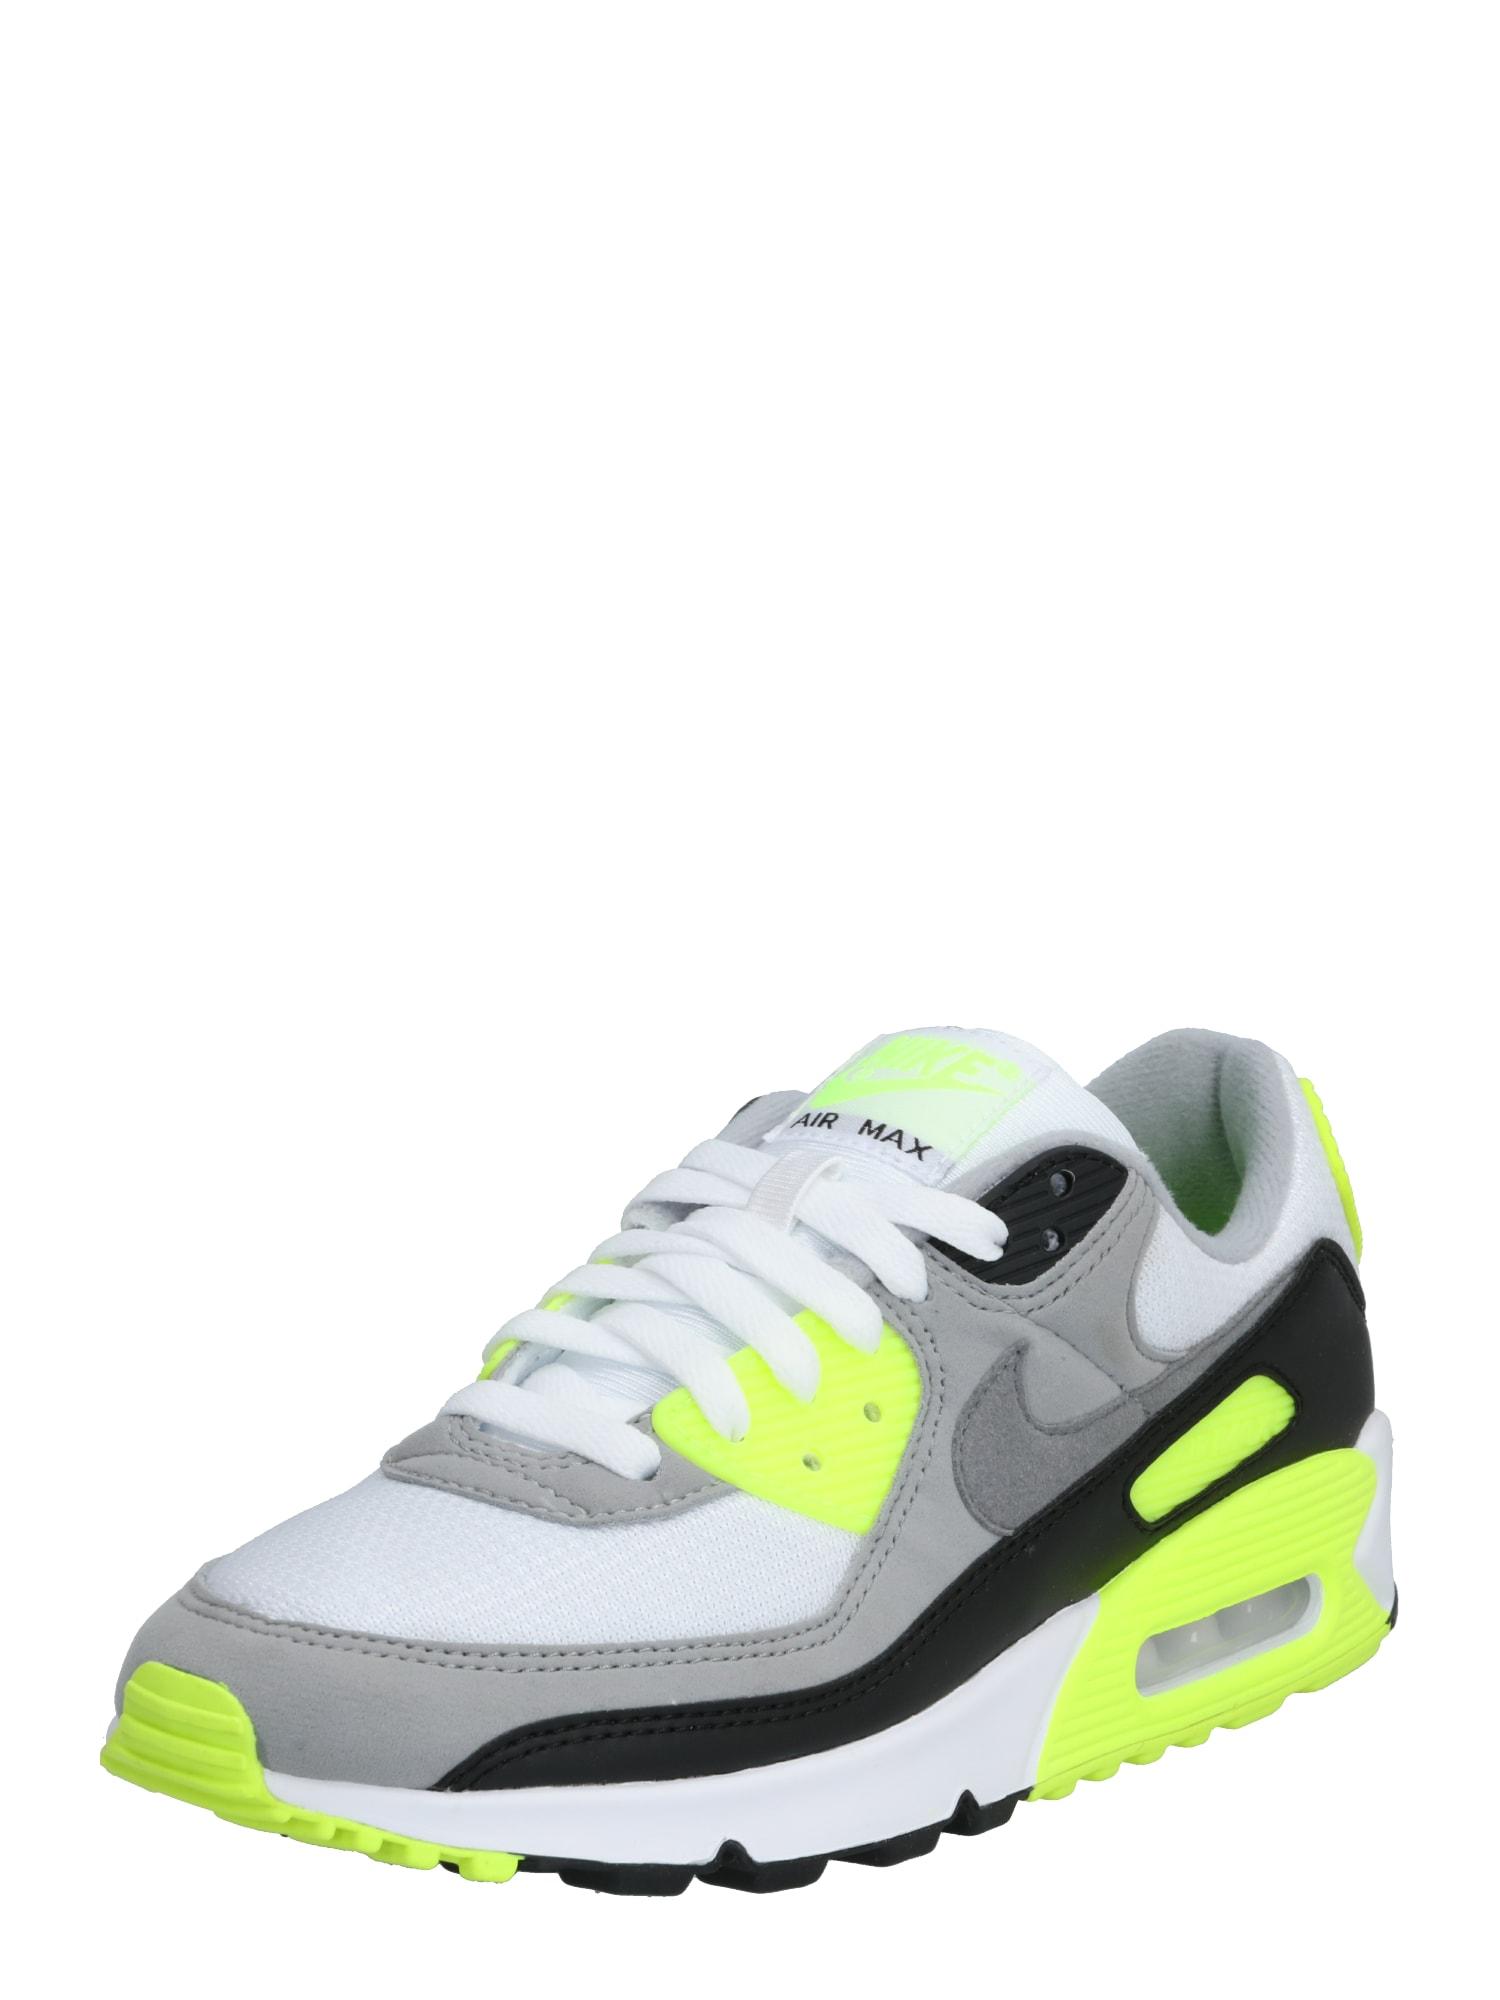 Nike Sportswear Nízke tenisky 'Nike Air Max 90'  sivá / limetová / biela